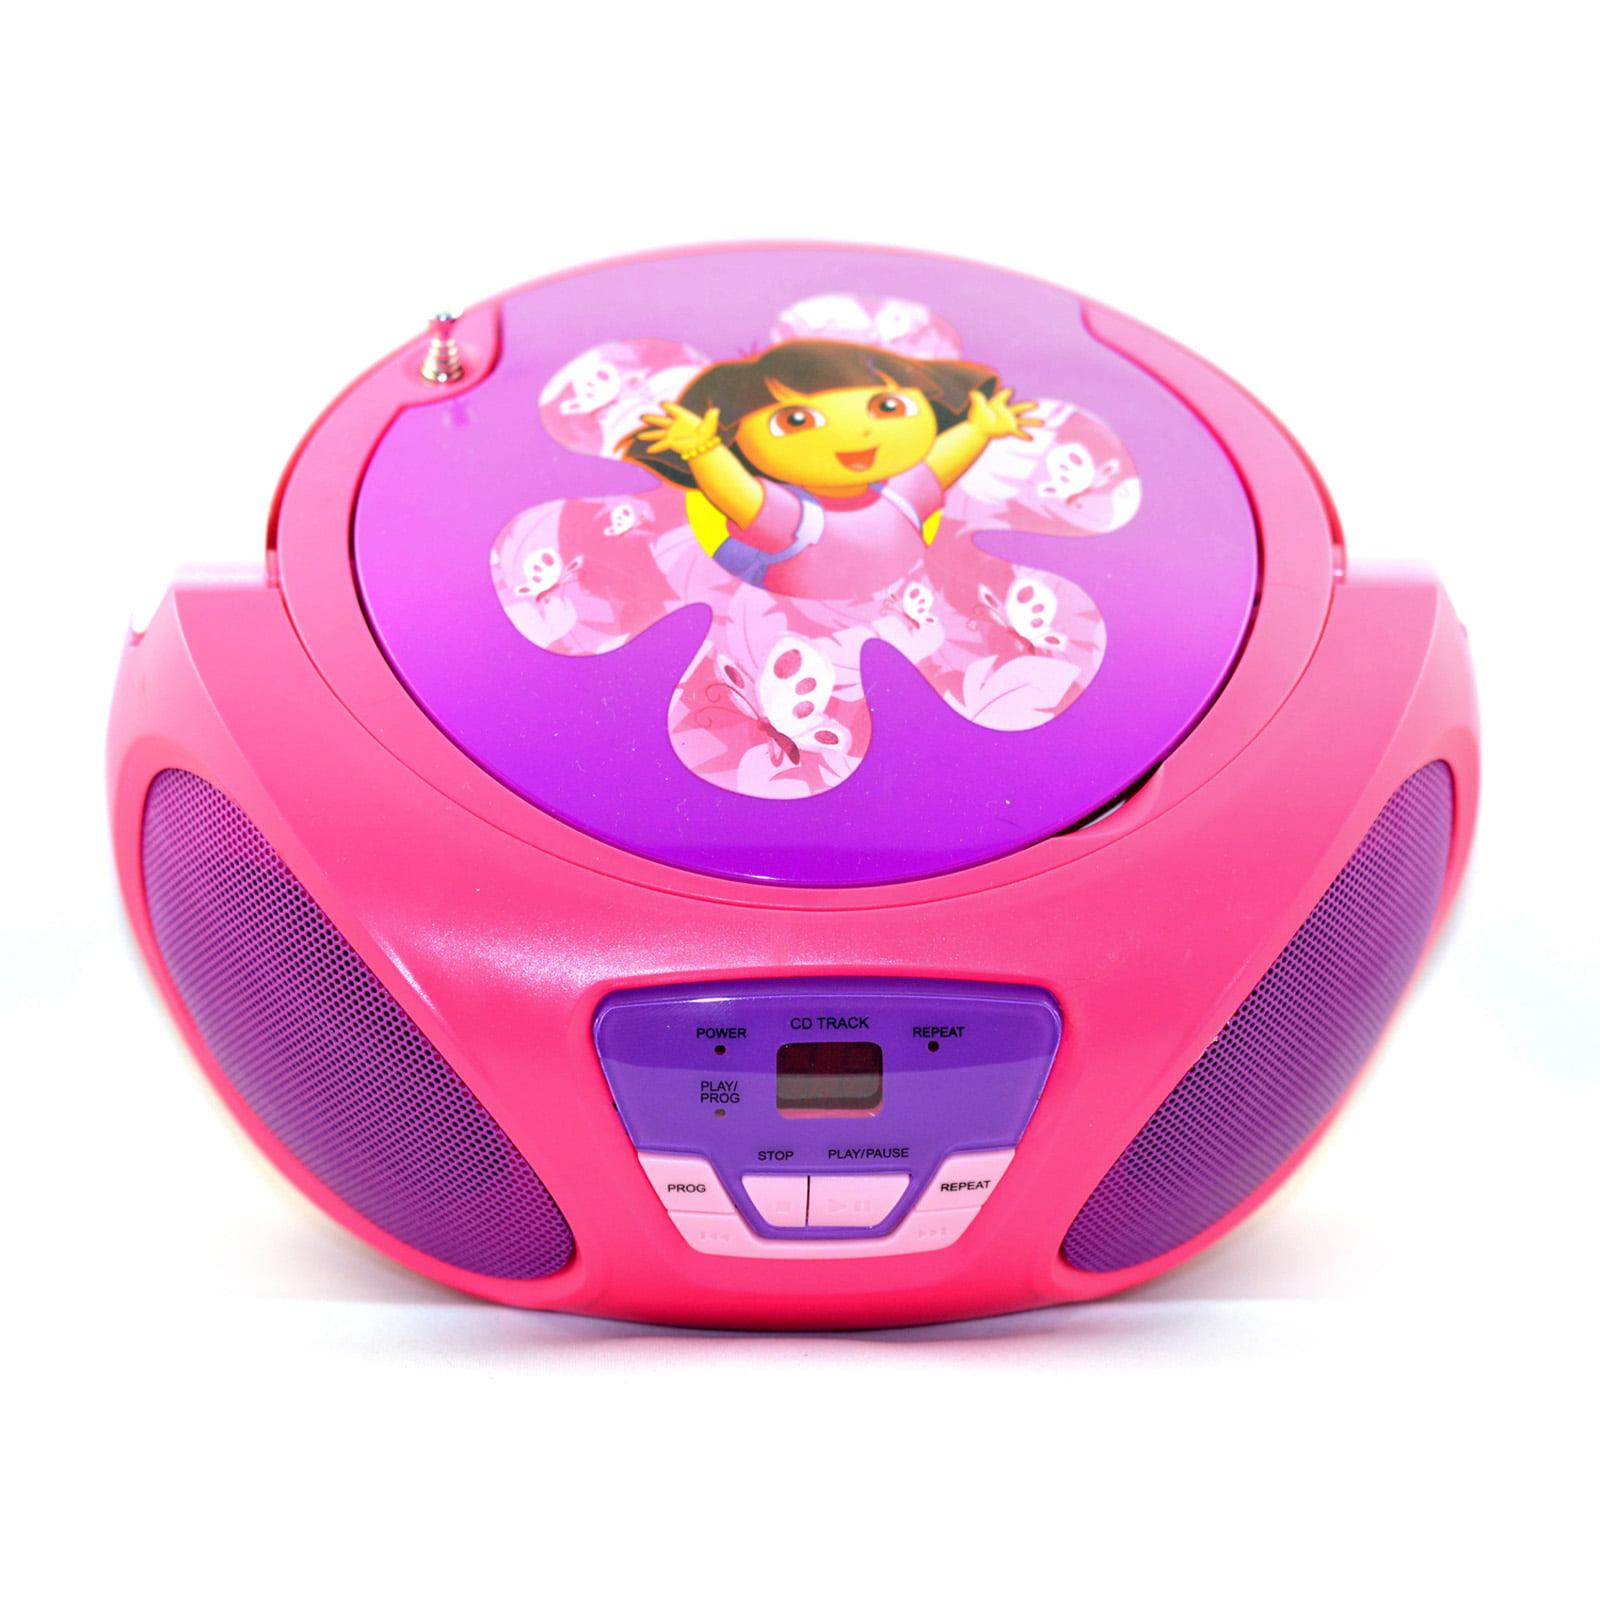 Dora the Explorer CD Boombox by Dora The Explorer